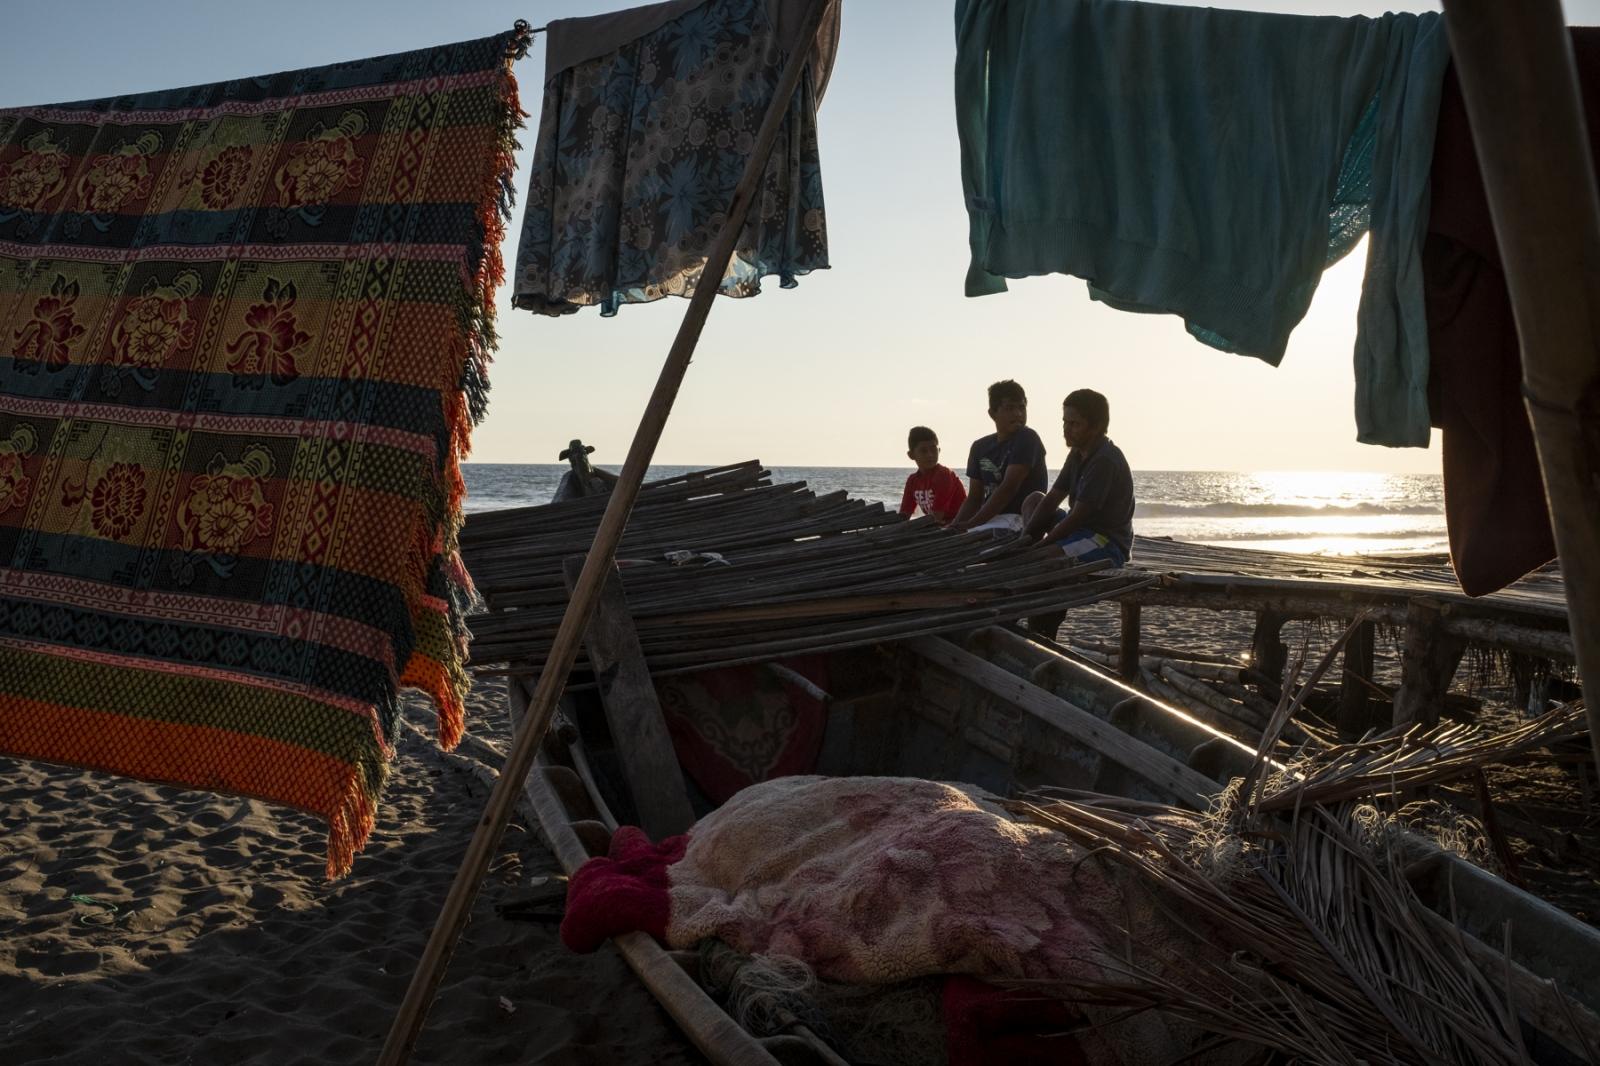 Melvin Elias (middle), 16, waits for a friend before going fishing near his home in La Barra de Santiago, El Salvador.